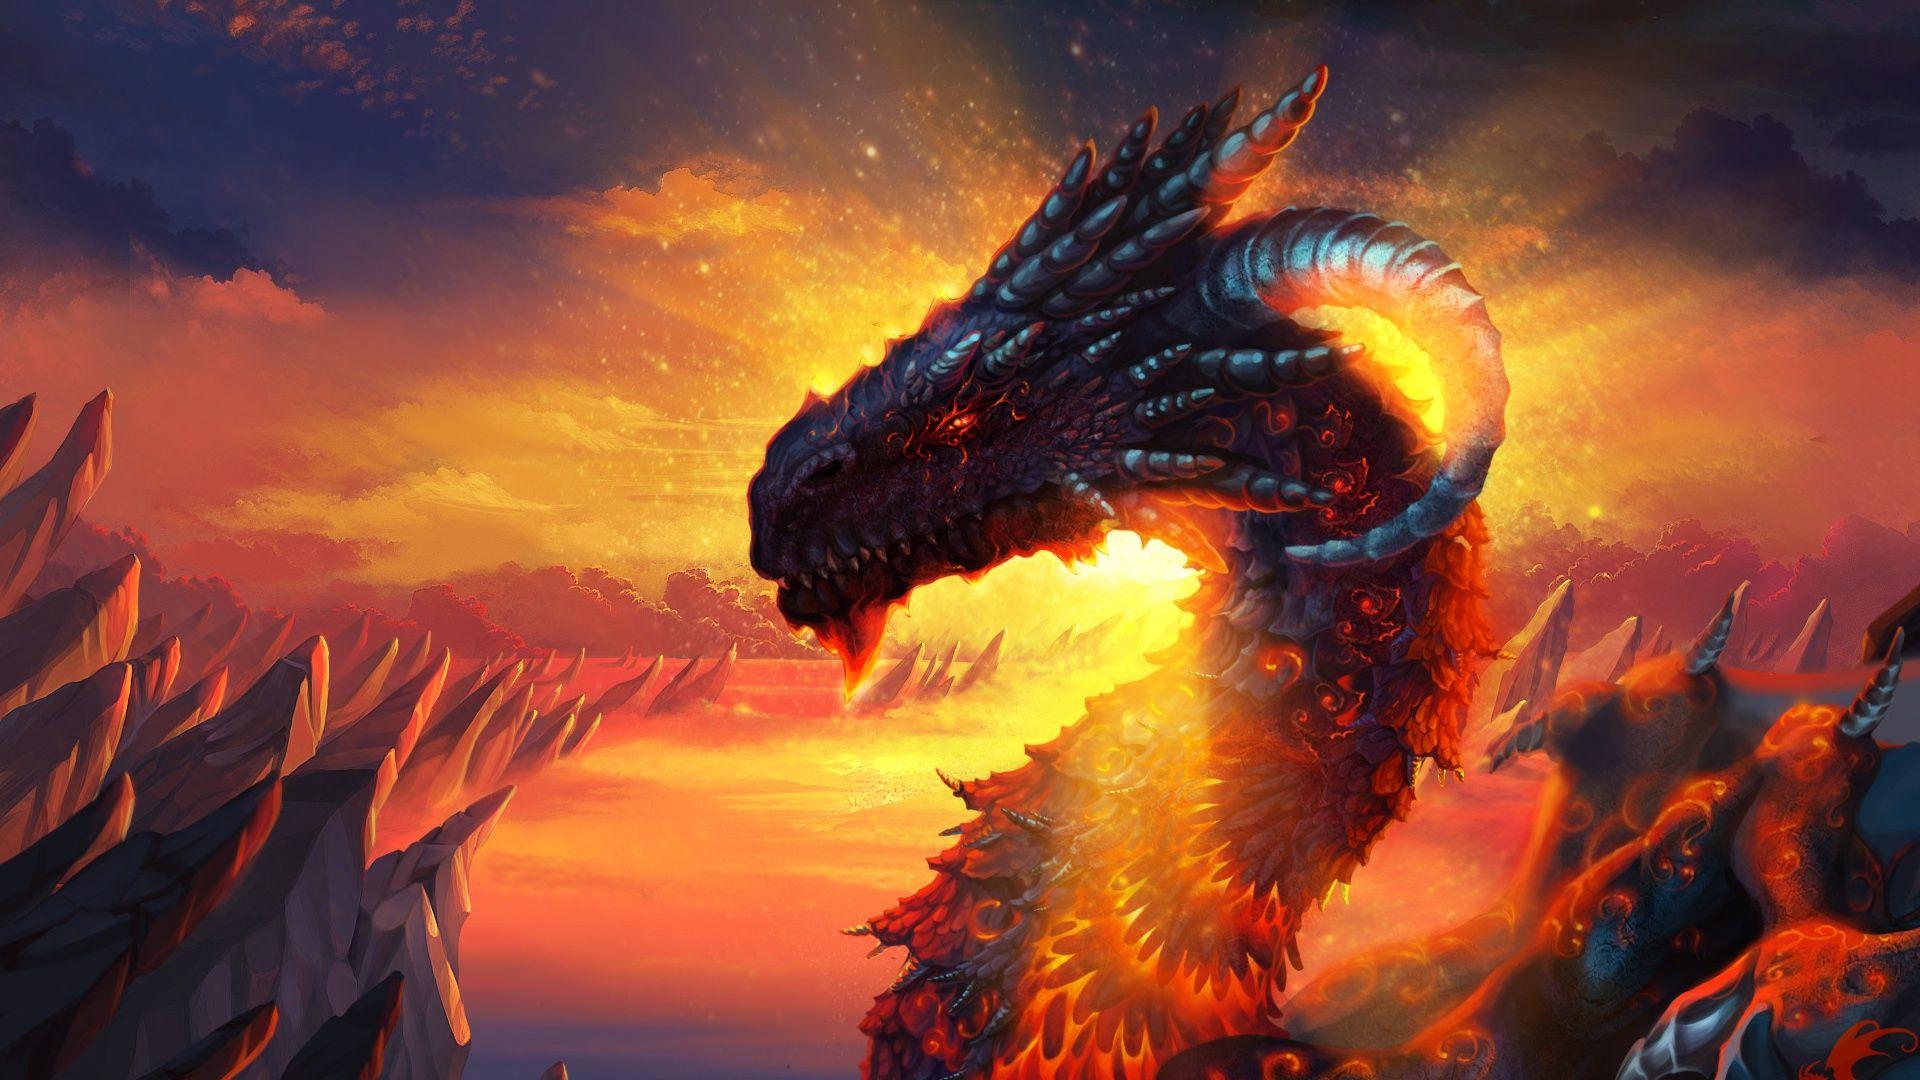 hd wallpaper 1920x1080 dragon dragon lava sky hd wallpaper